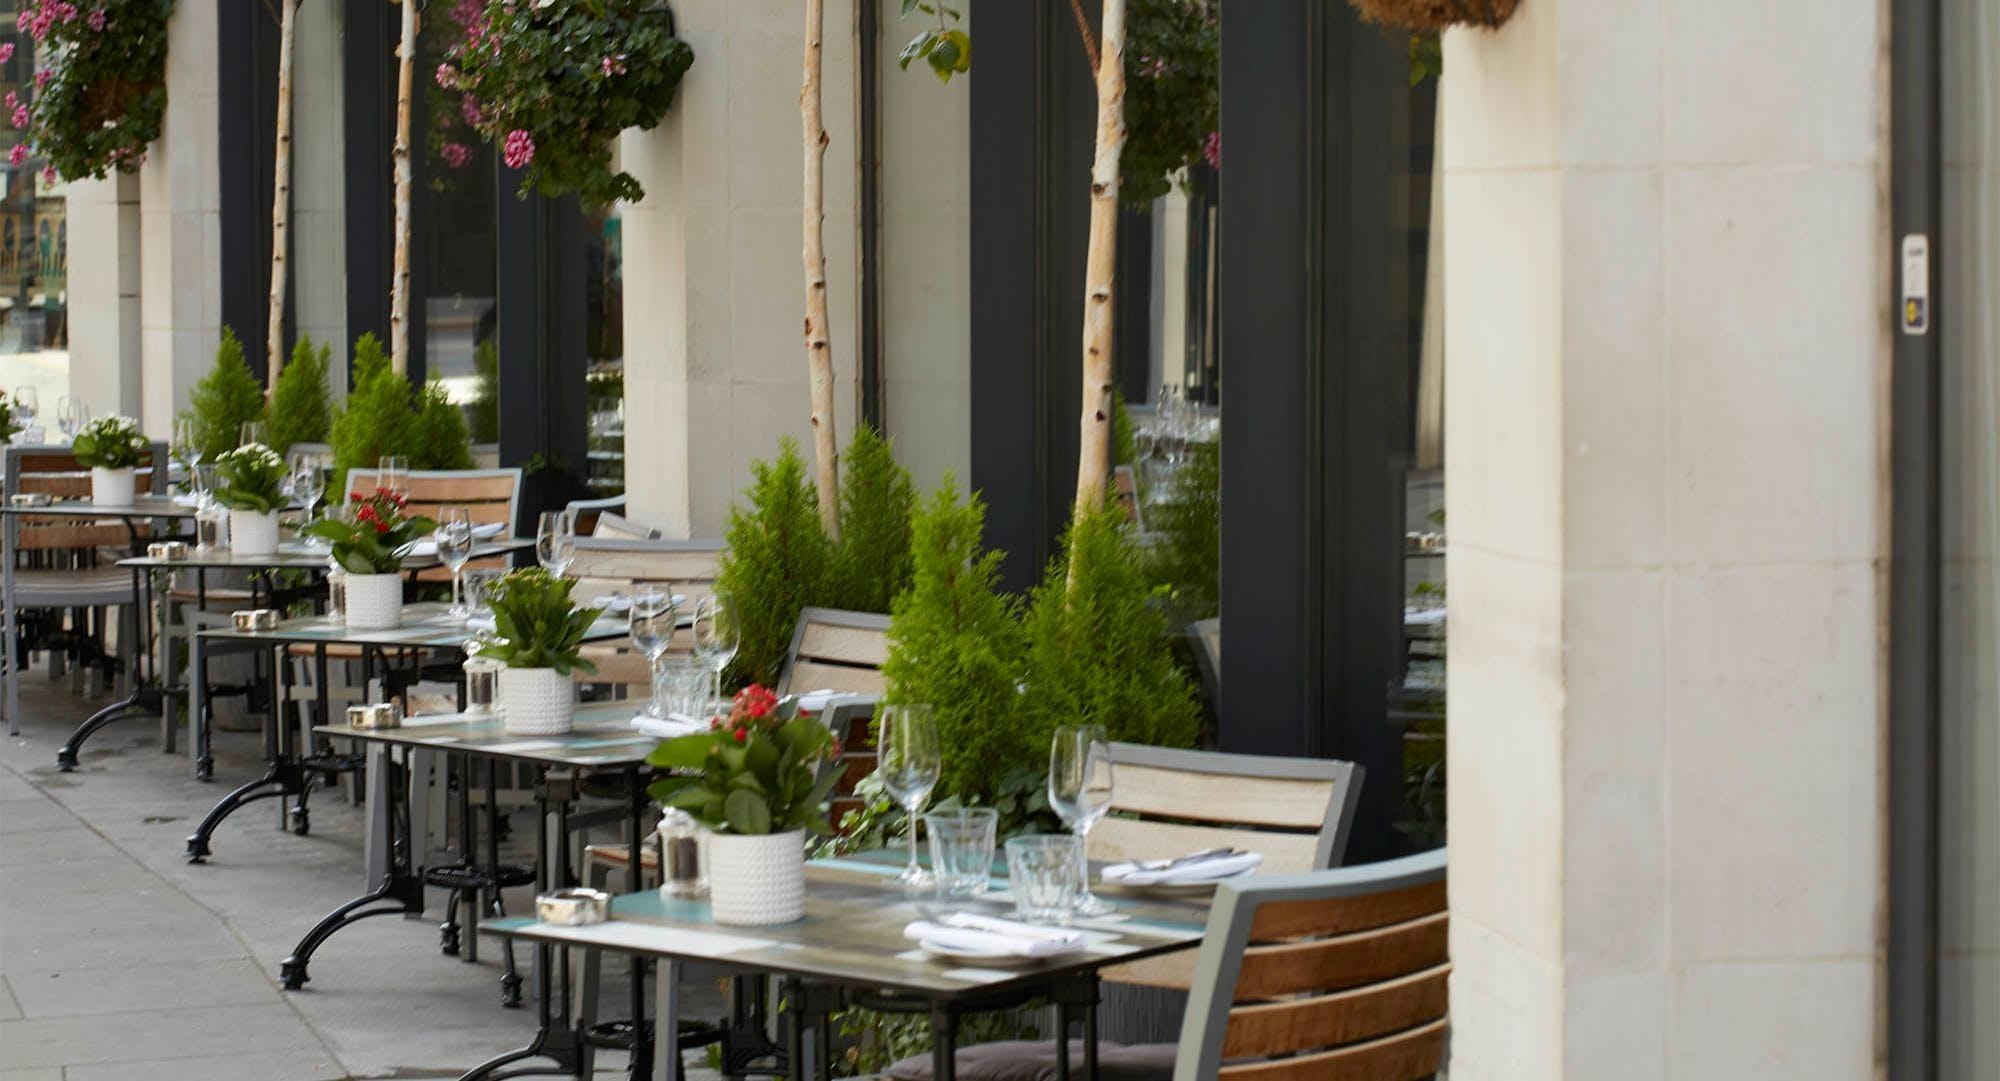 Photo of restaurant 28-50 Wine Workshop & Kitchen - Marylebone in Marylebone, London